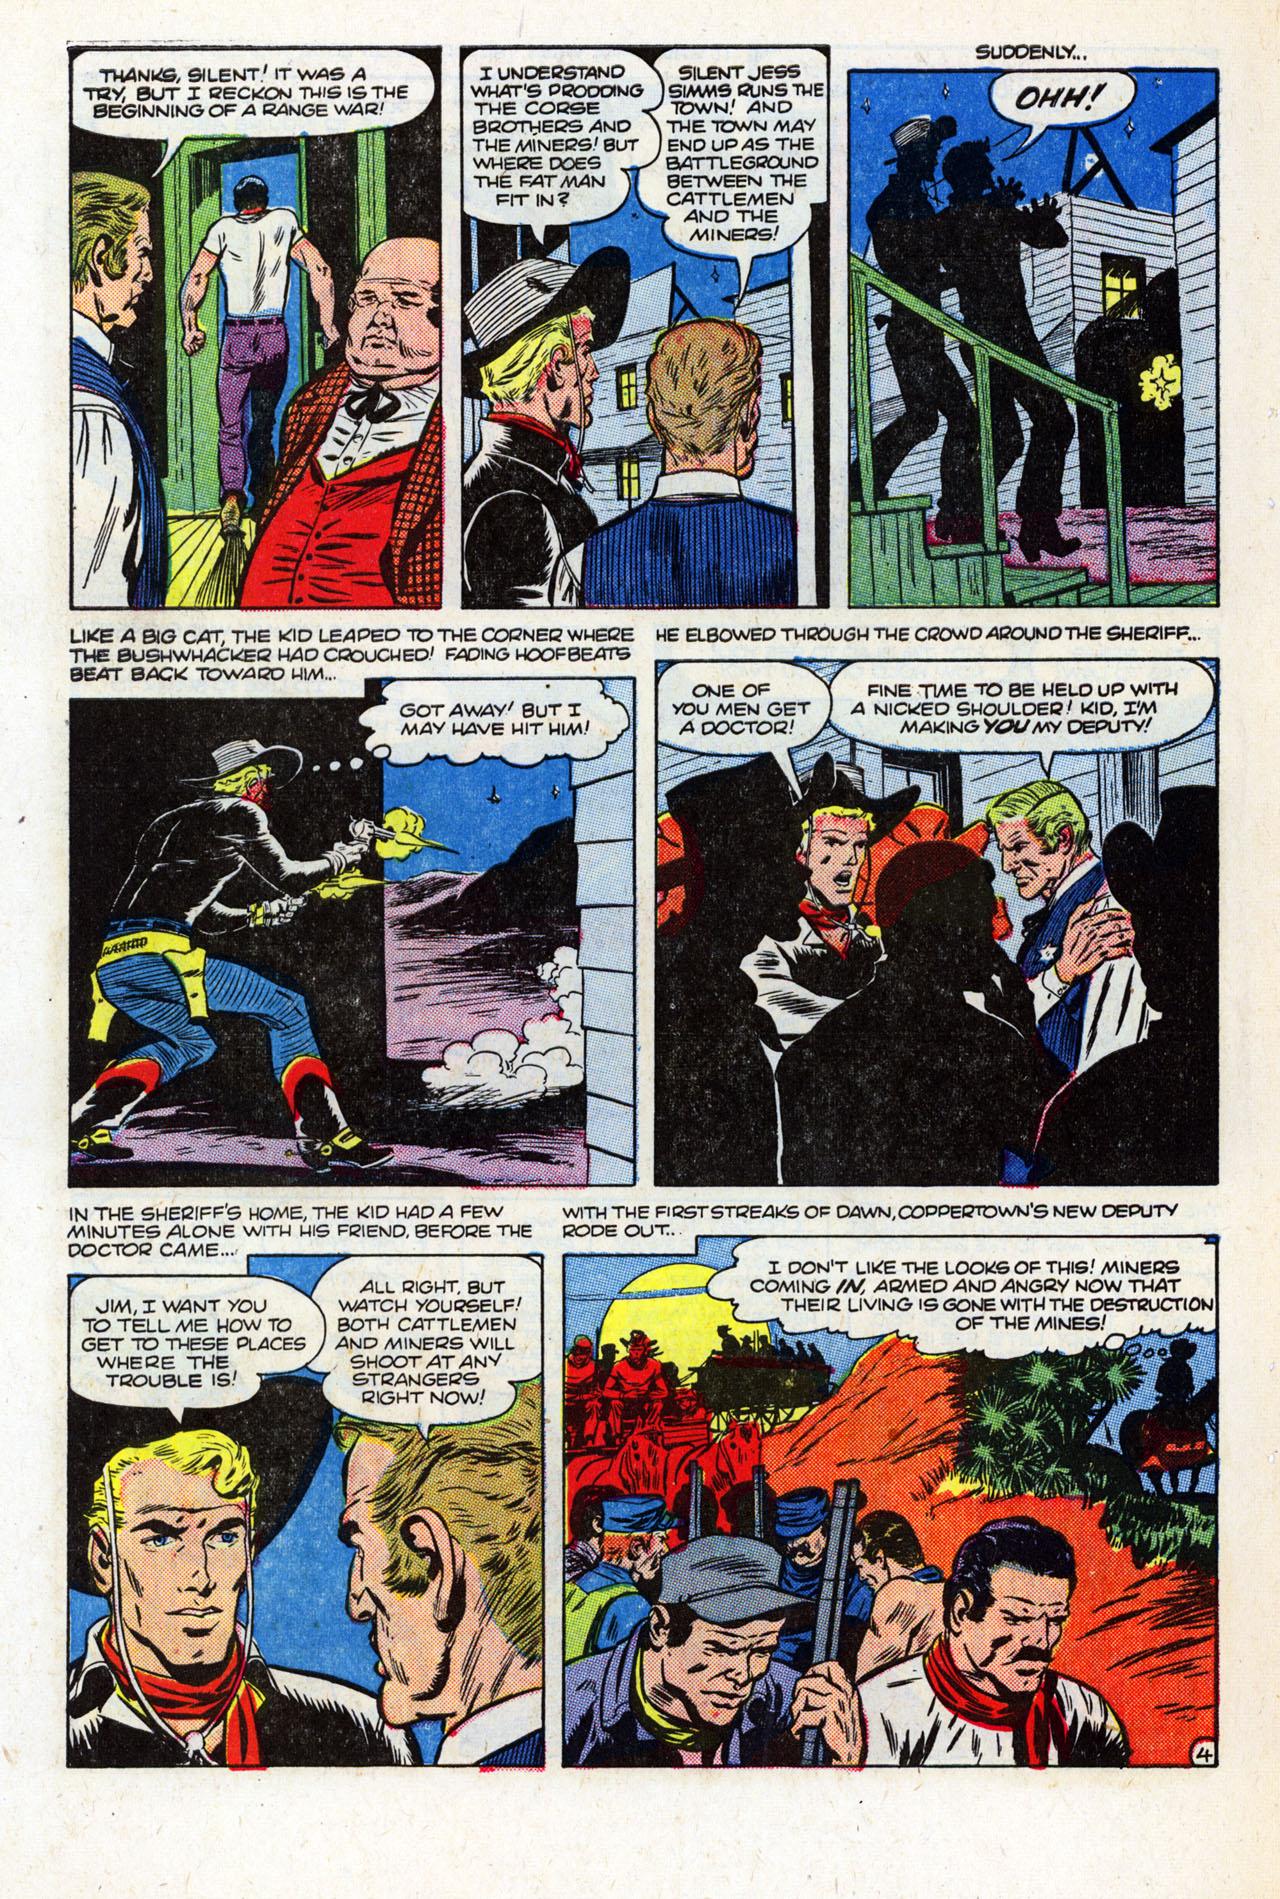 Read online Two-Gun Kid comic -  Issue #23 - 30